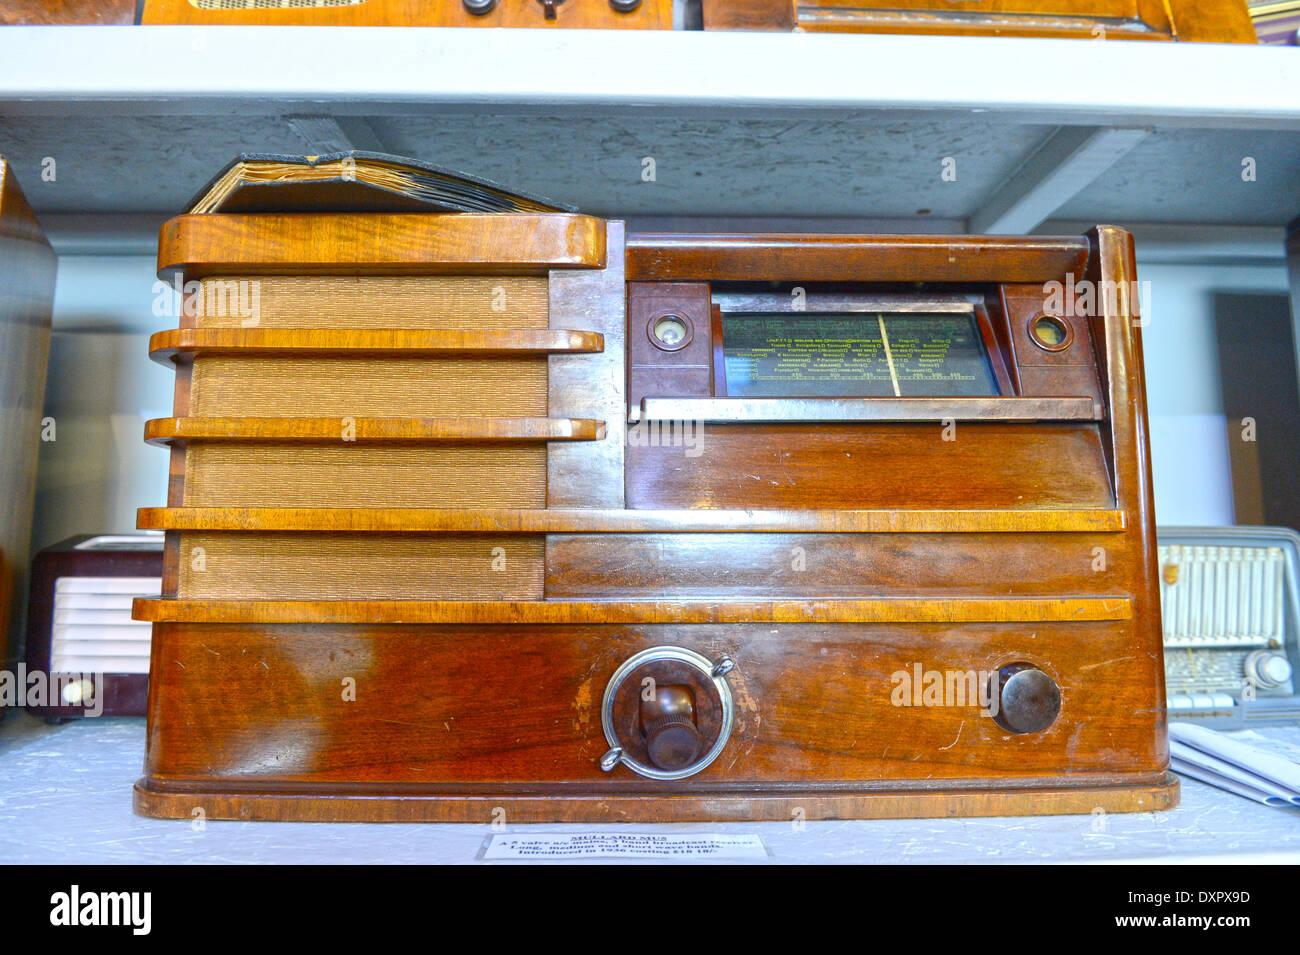 Antique Radios at the Hoswick Visitor Museum Shetland Scotland - Stock Image